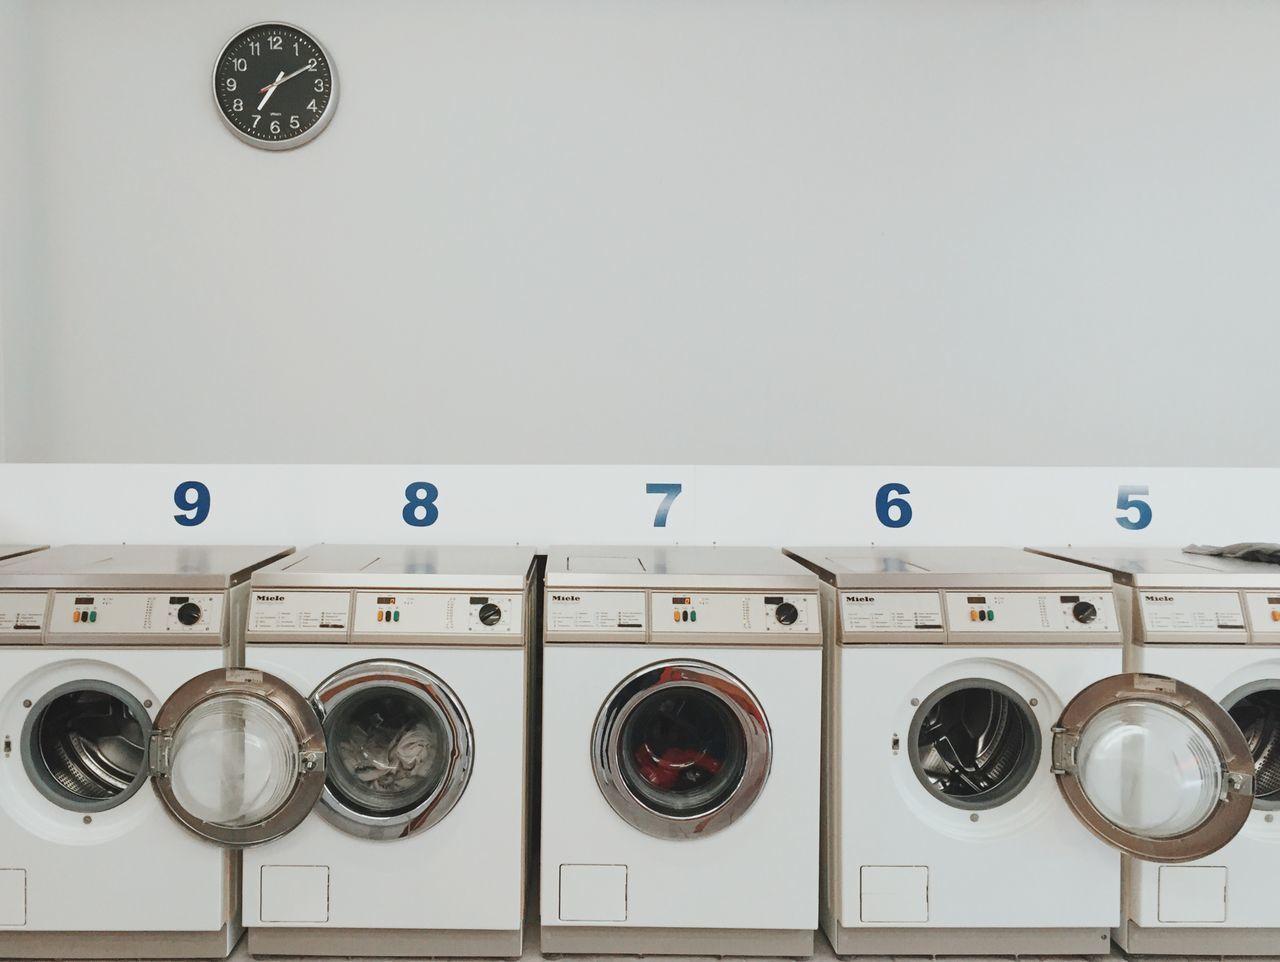 Washing machines against wall